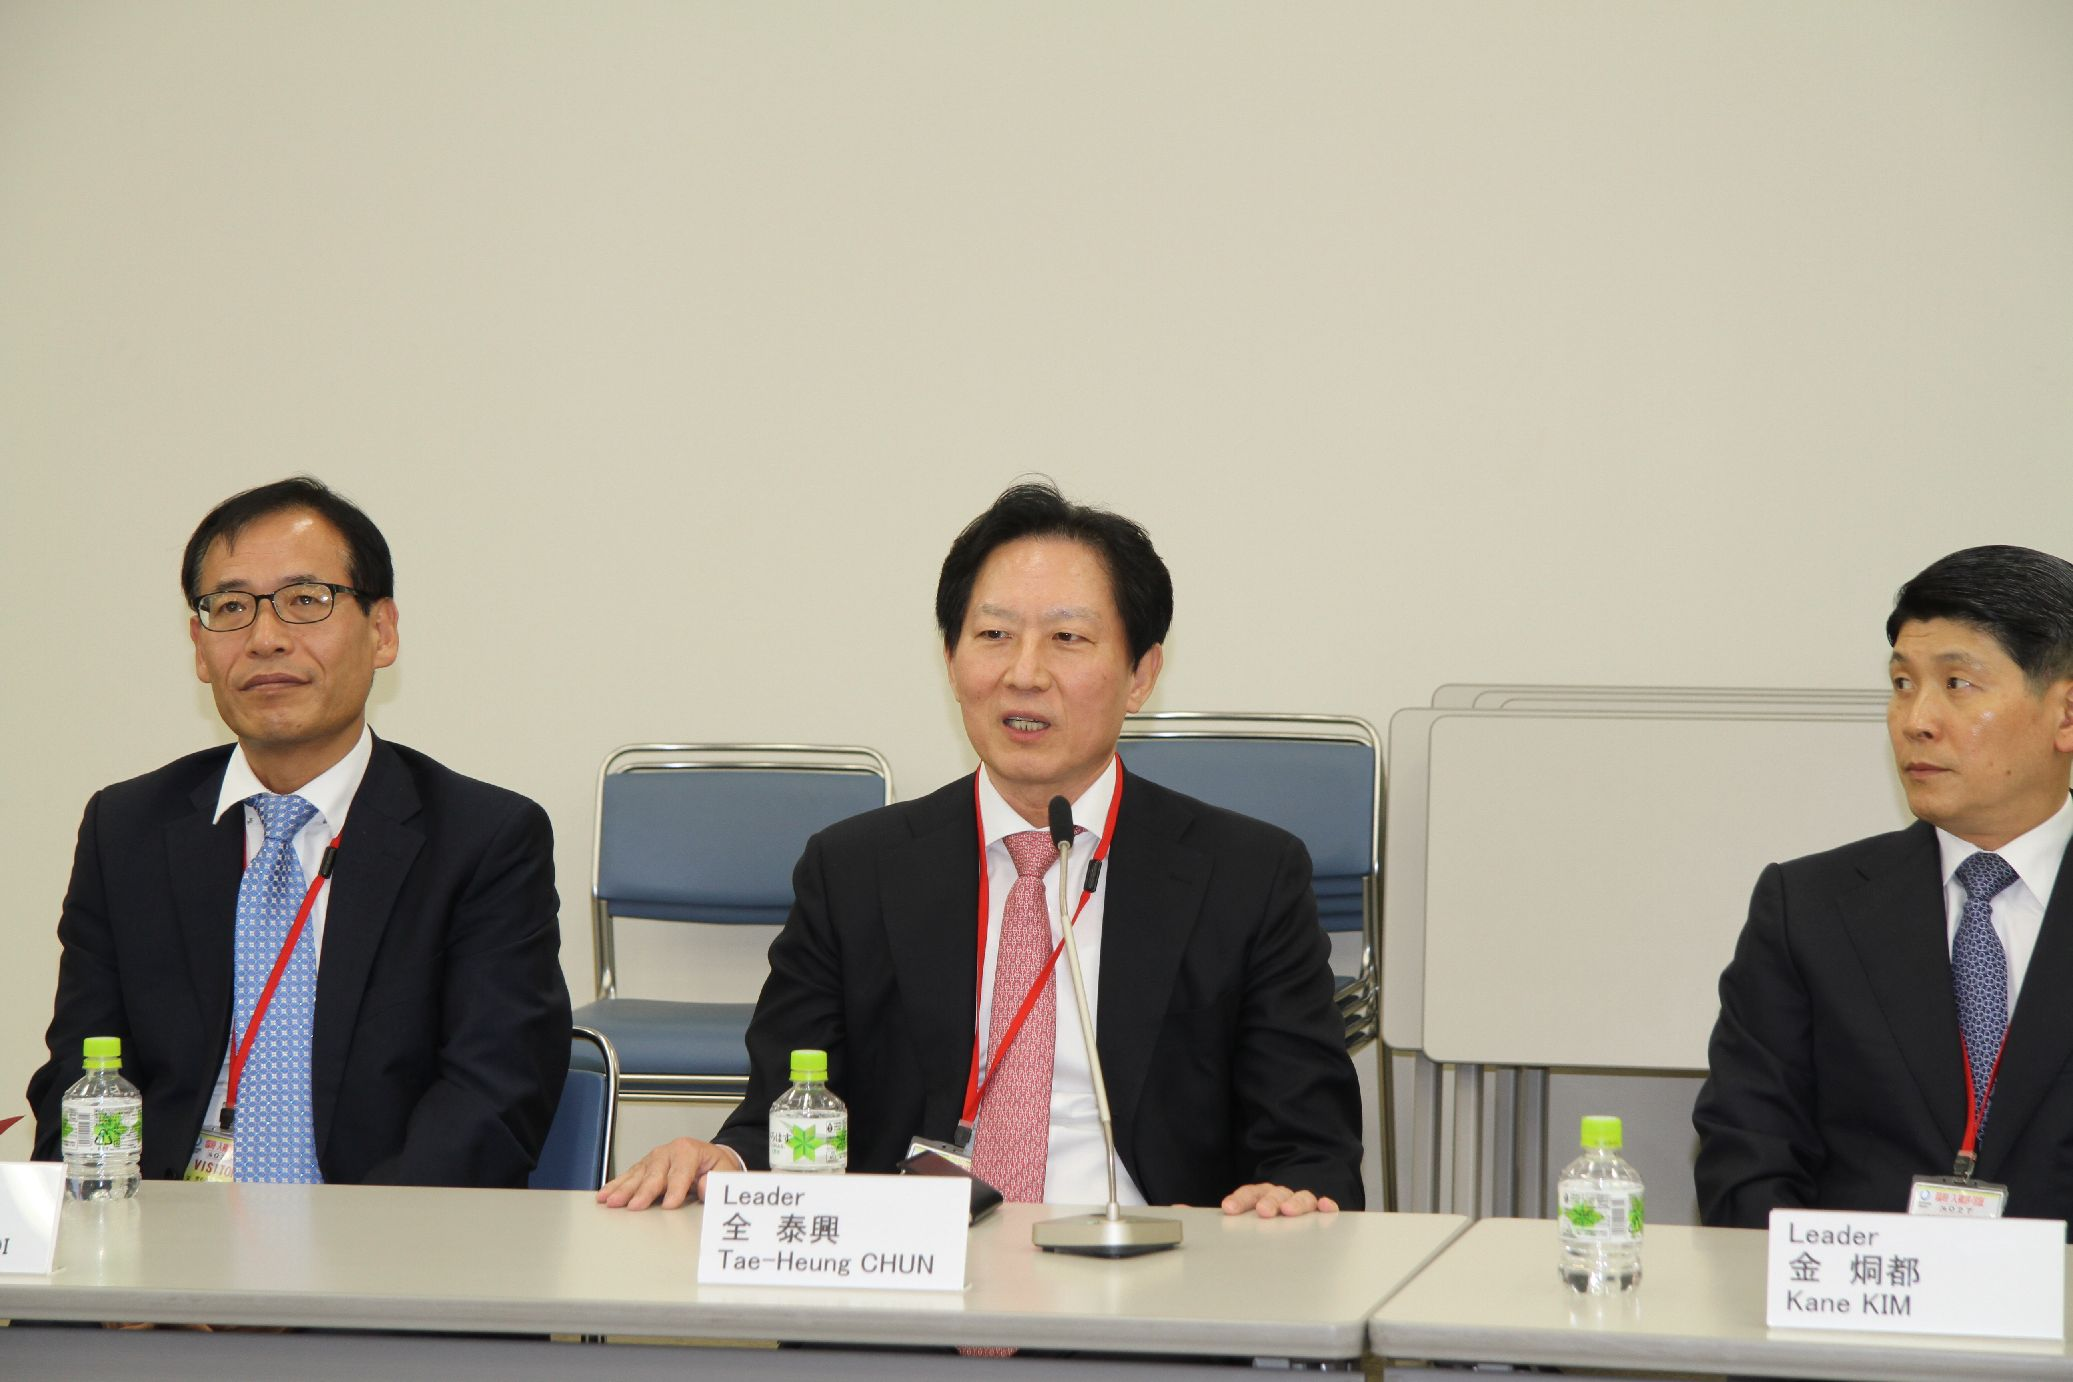 Vice President Jeon Tae-Heung gave a speech